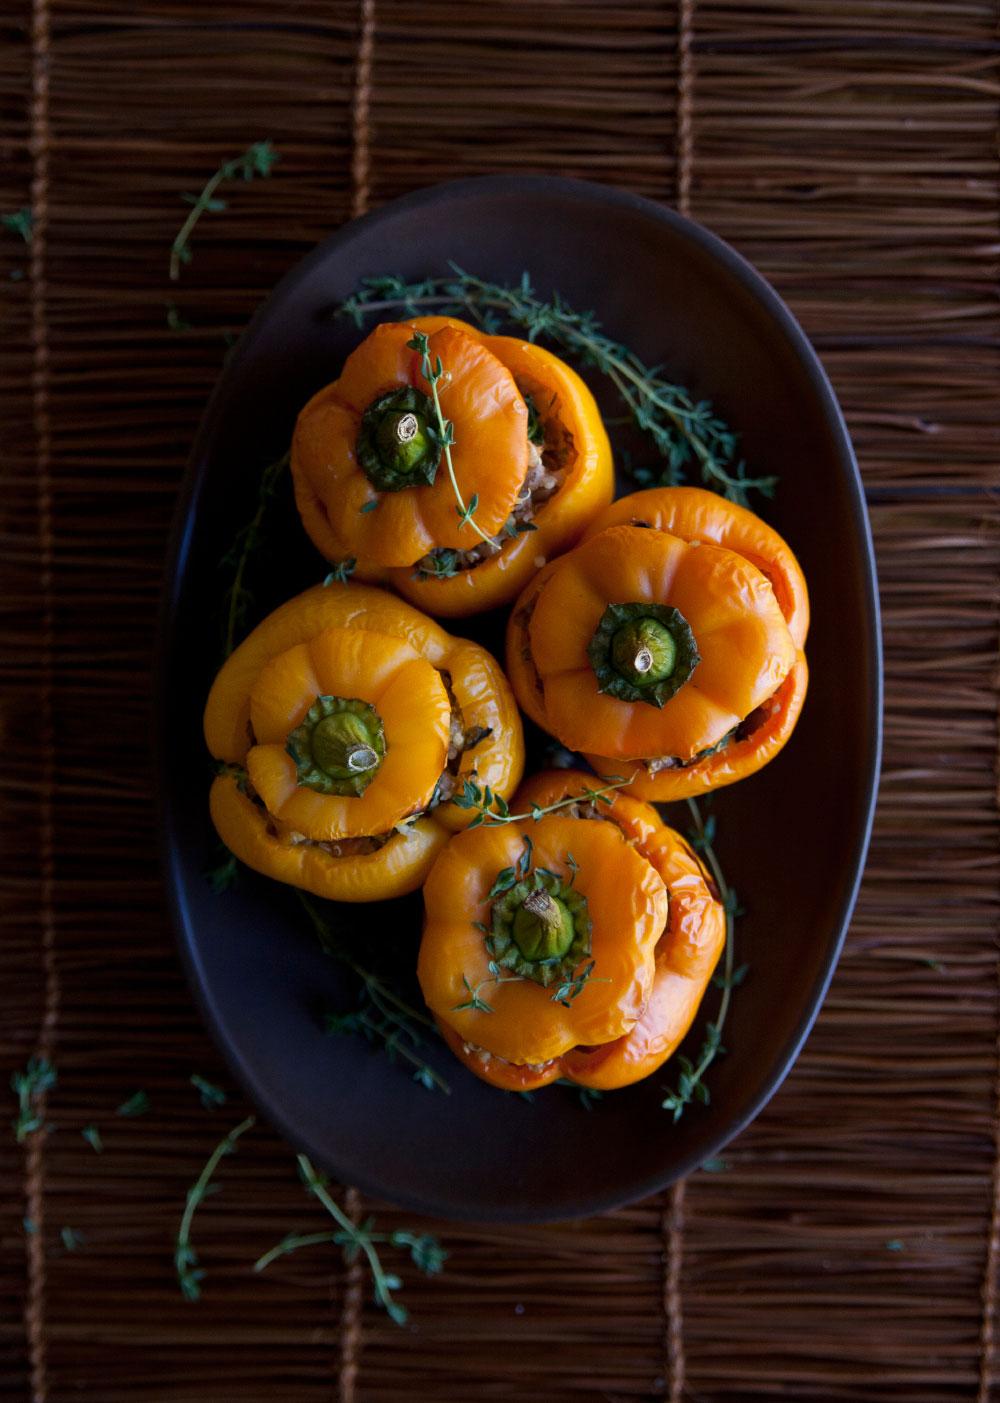 Pure-Ella-Squash-and-Quinoa-Stuffed-Yellow-Peppers-gluten-free-and-vegan-recipe2